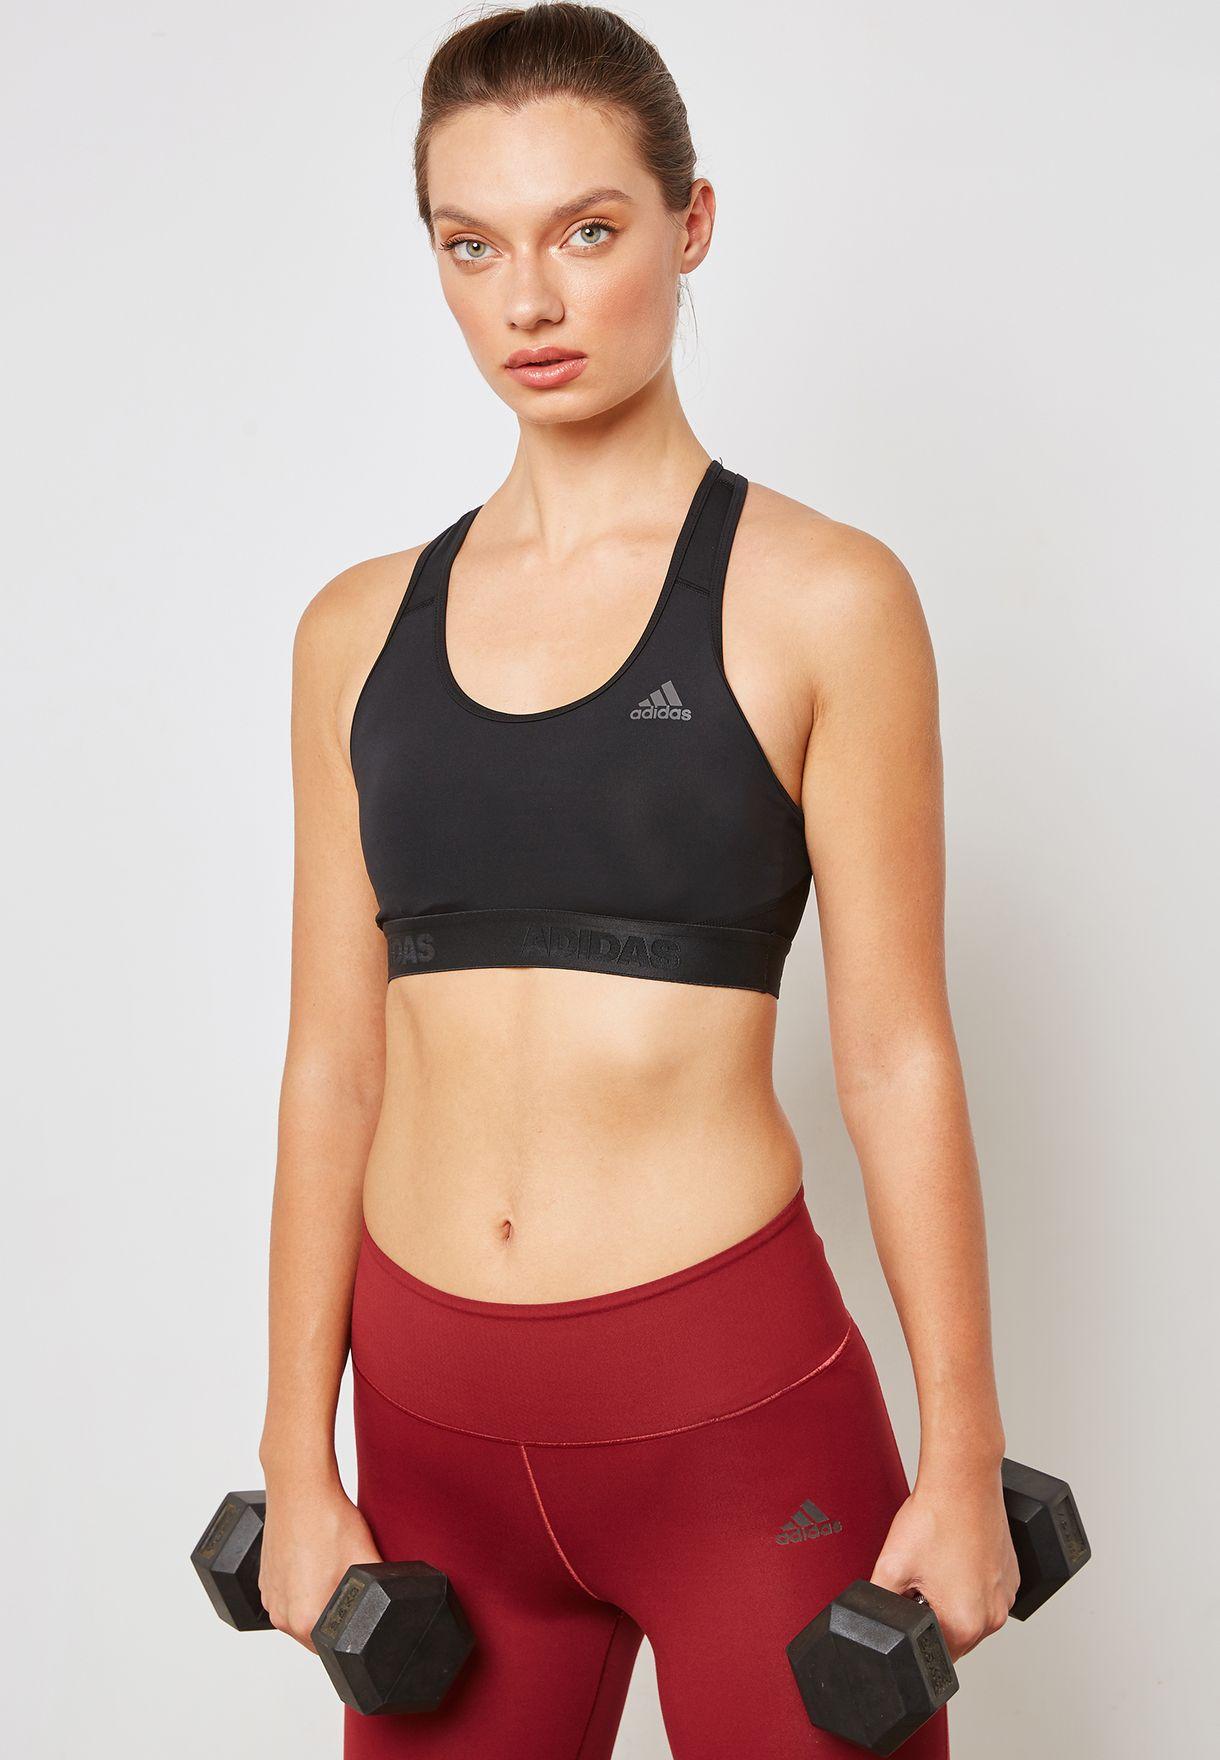 741c97e8d7 Shop adidas black Alphaskin Sports Bra CD9718 for Women in Qatar -  AD476AT41KKO